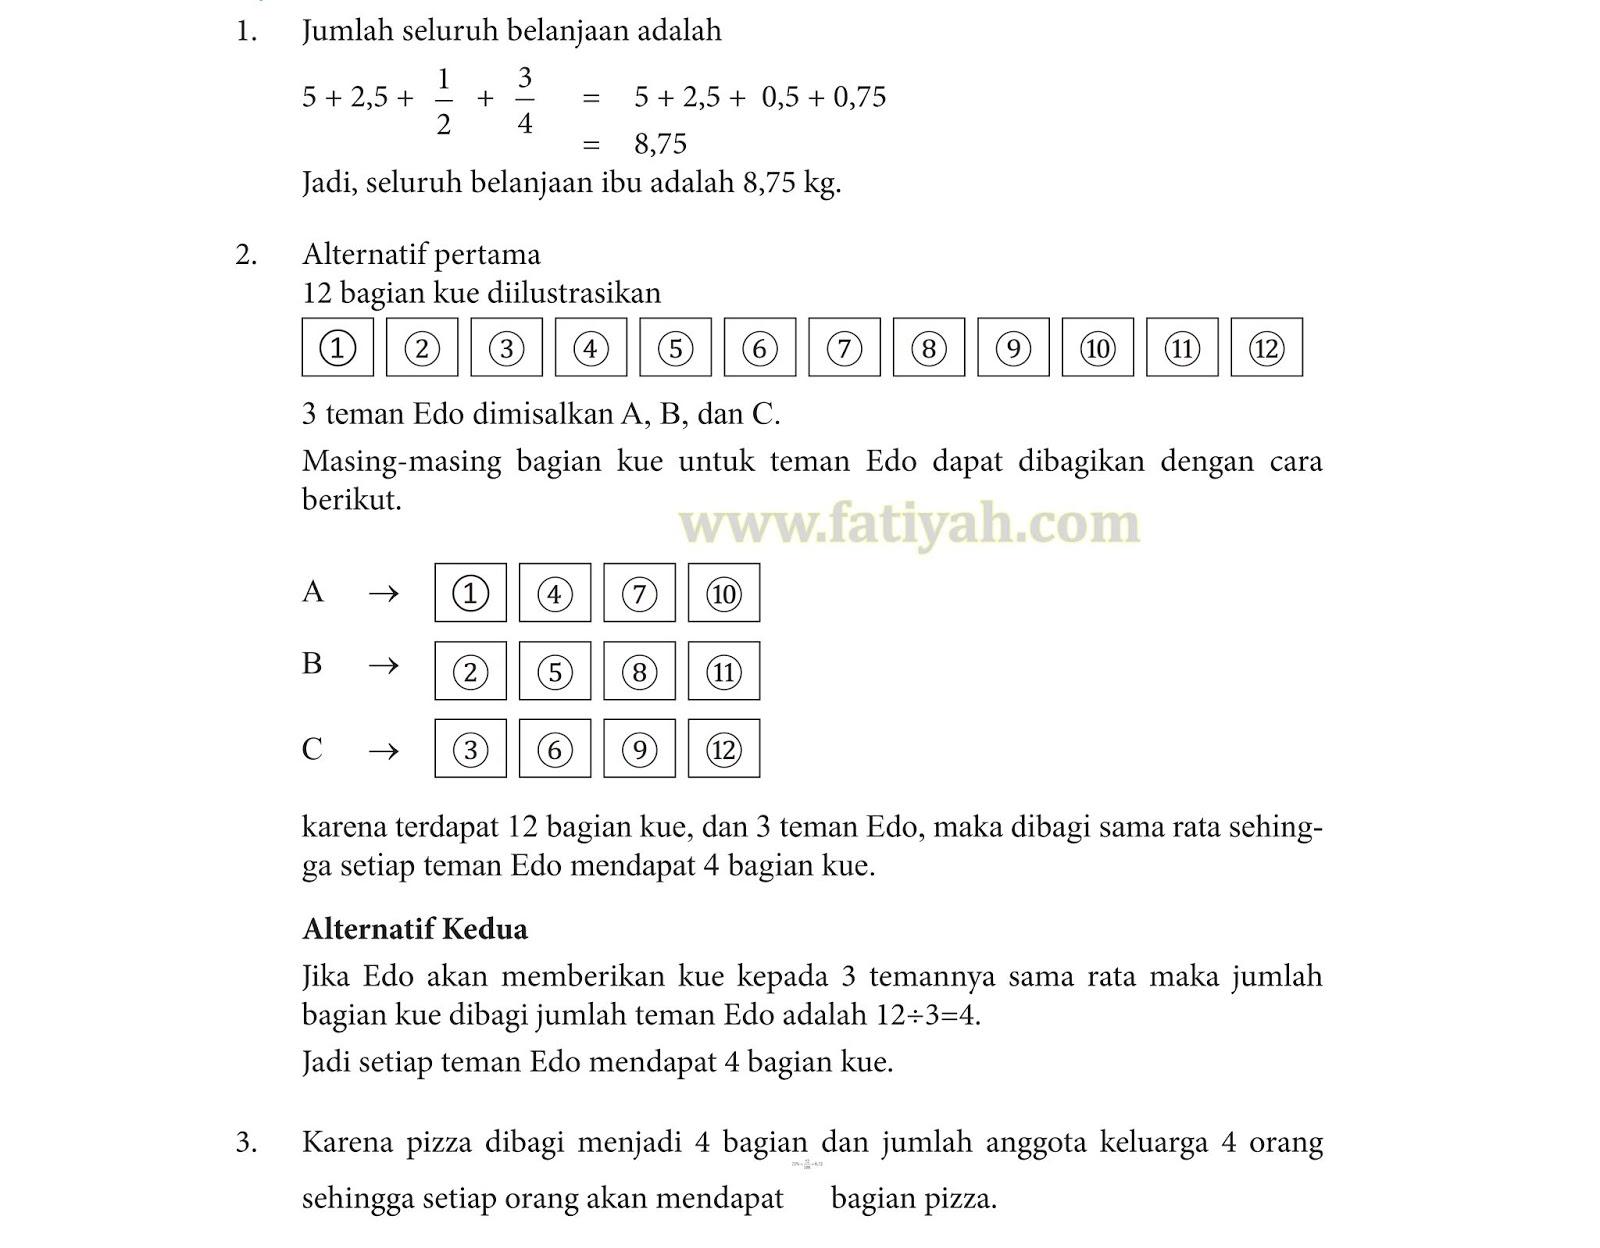 Kunci Jawaban Matematika Kelas 4 Sd Halaman 29 39 40 42 43 Lifanen